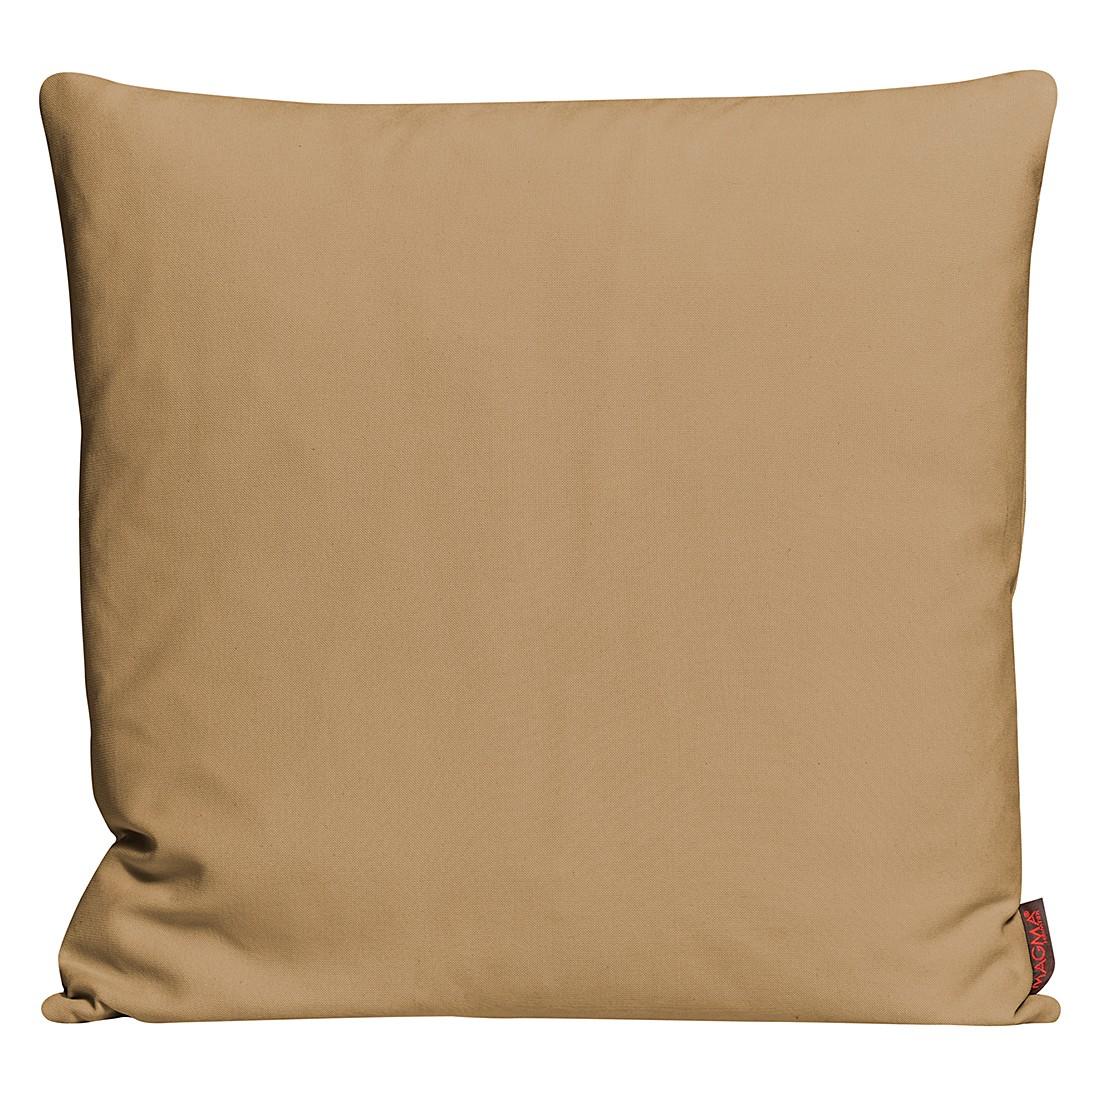 Kissenhülle Paso – Caramel – Maße: 50 x 50 cm, Magma-Heimtex günstig